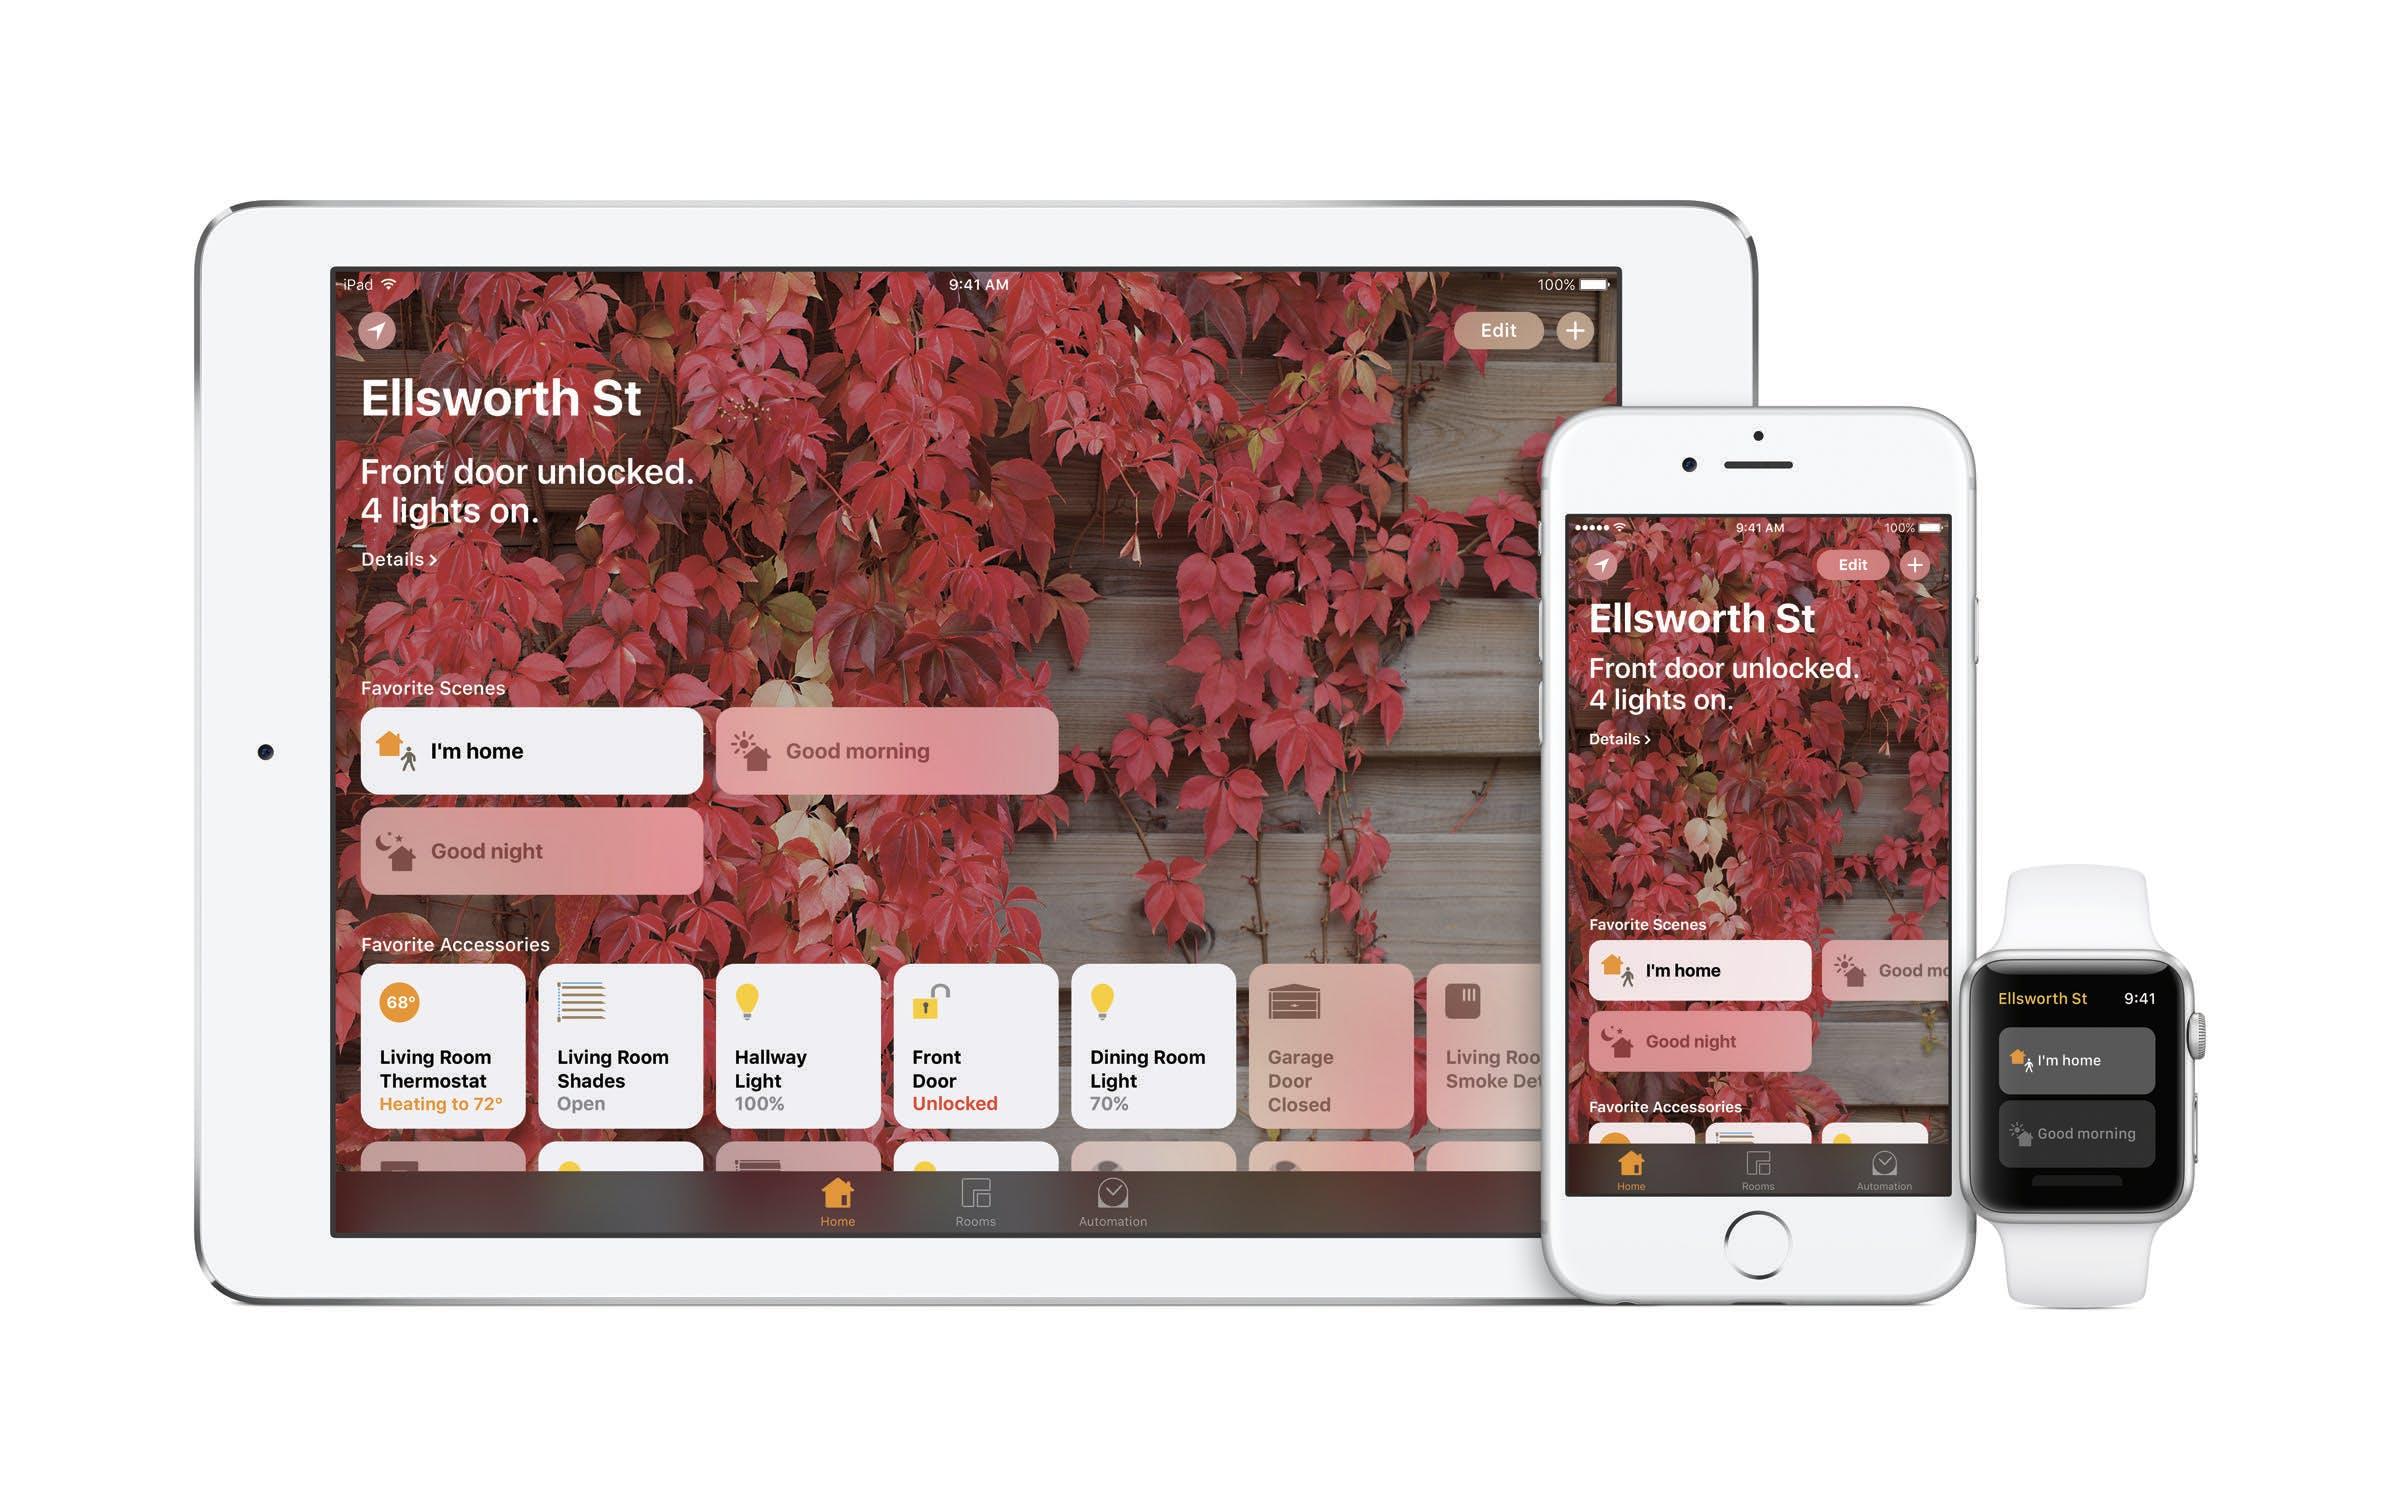 iOS 10 im Praxistest: So fühlt sich das neue Betriebssystem für das iPhone 7 an